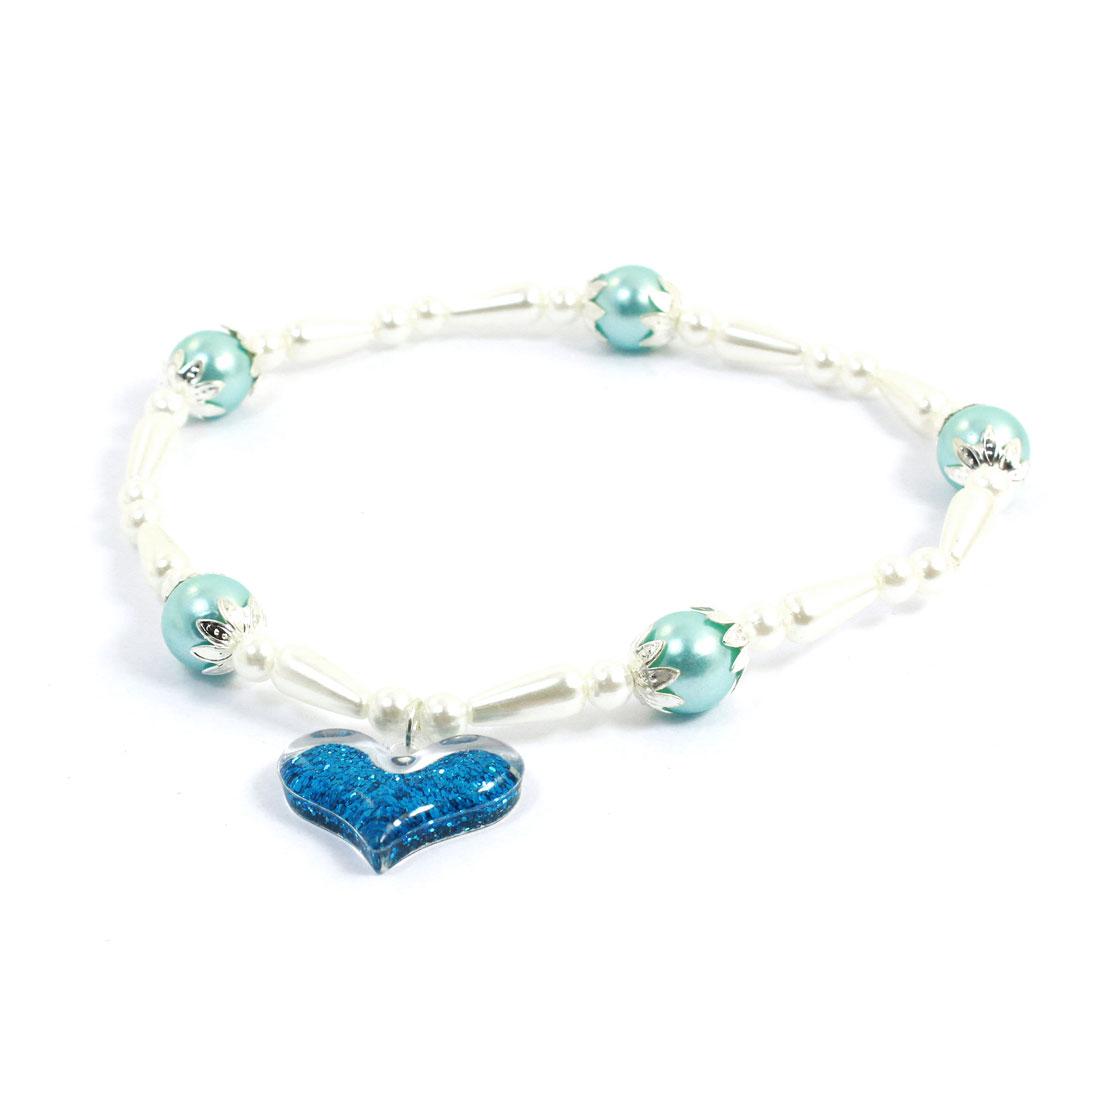 Heart Shape Pendant Decor Plastic Beads Linked Stretchy Pet Dog Necklace M Blue